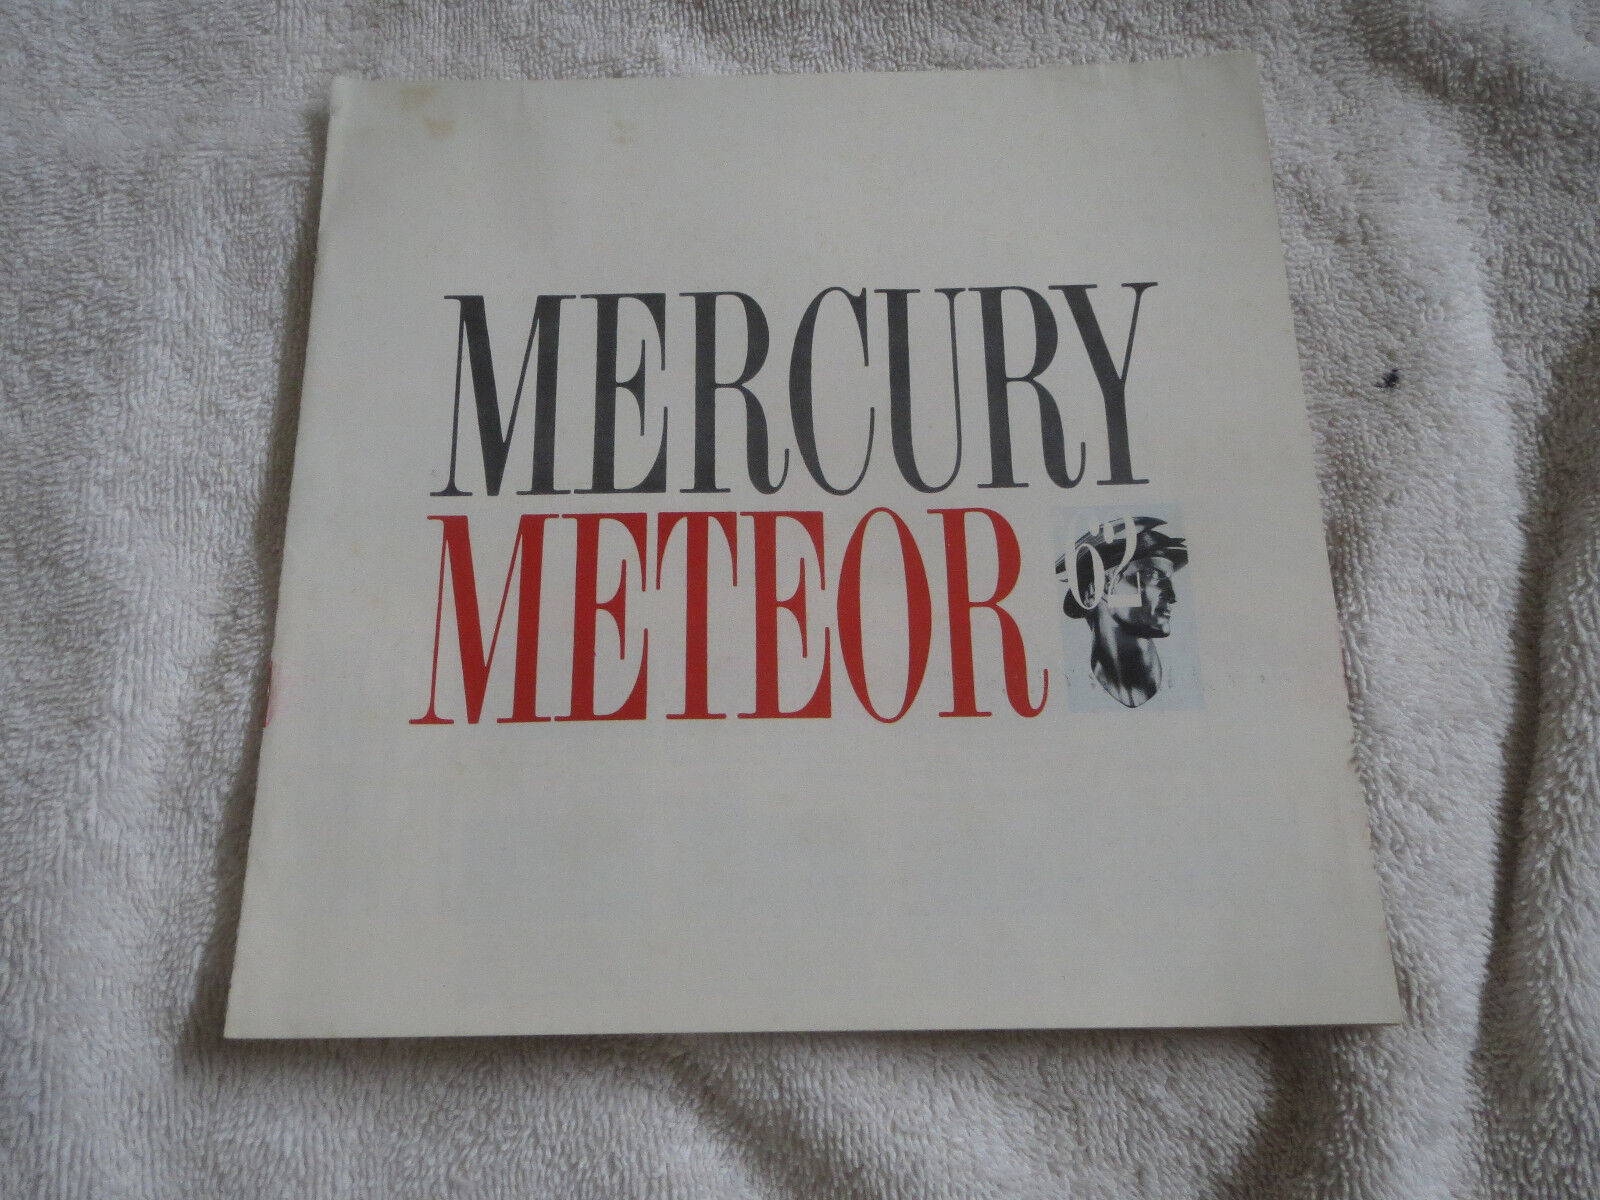 1962 MERCURY METEOR MODEL INTRODUCTION DEALERSHIP SALES BROCHURE